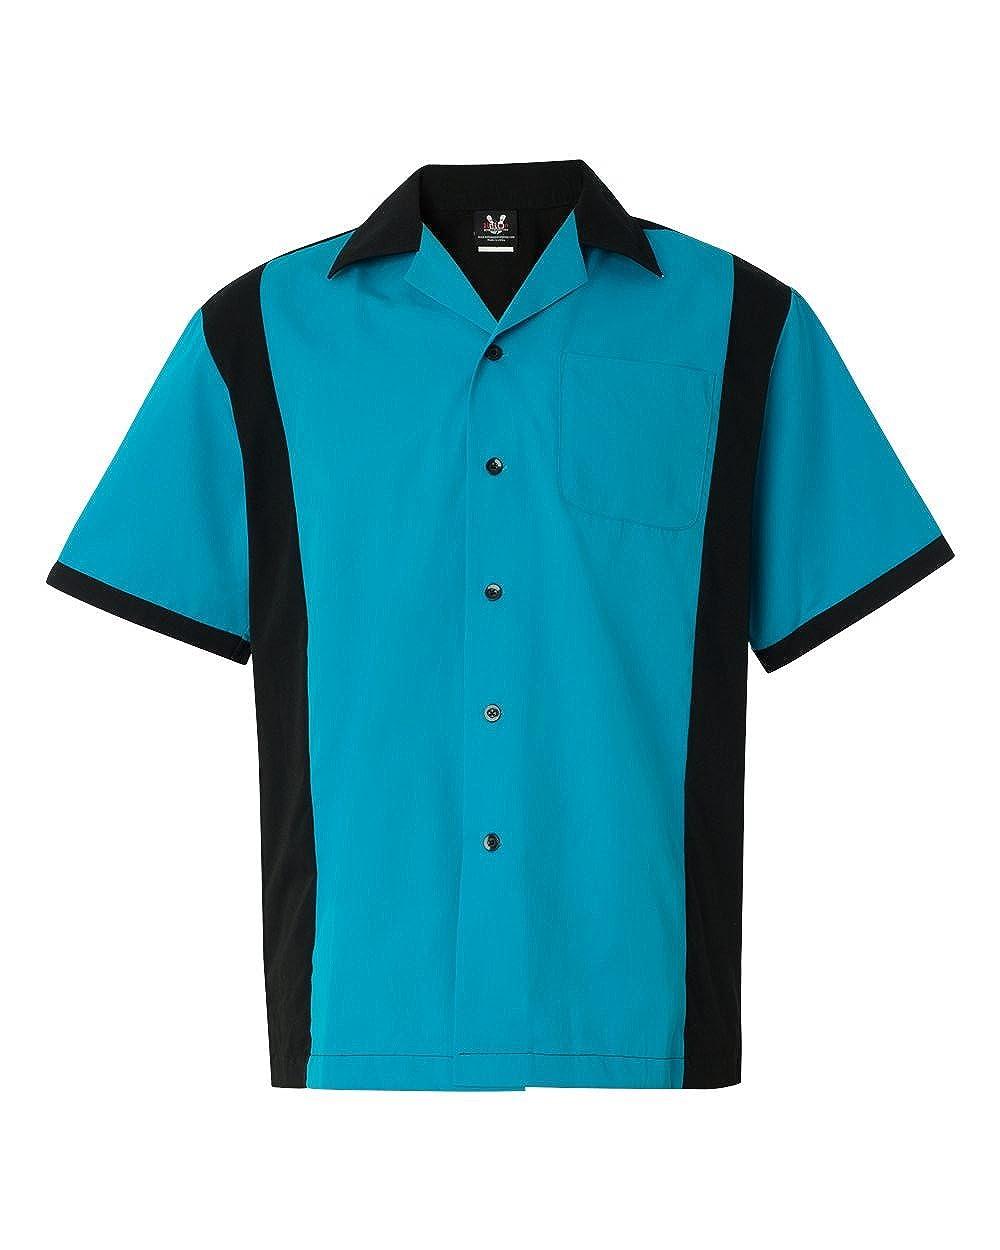 Hilton SHIRT メンズ B01EGM0AIE Turquoise/ Black M